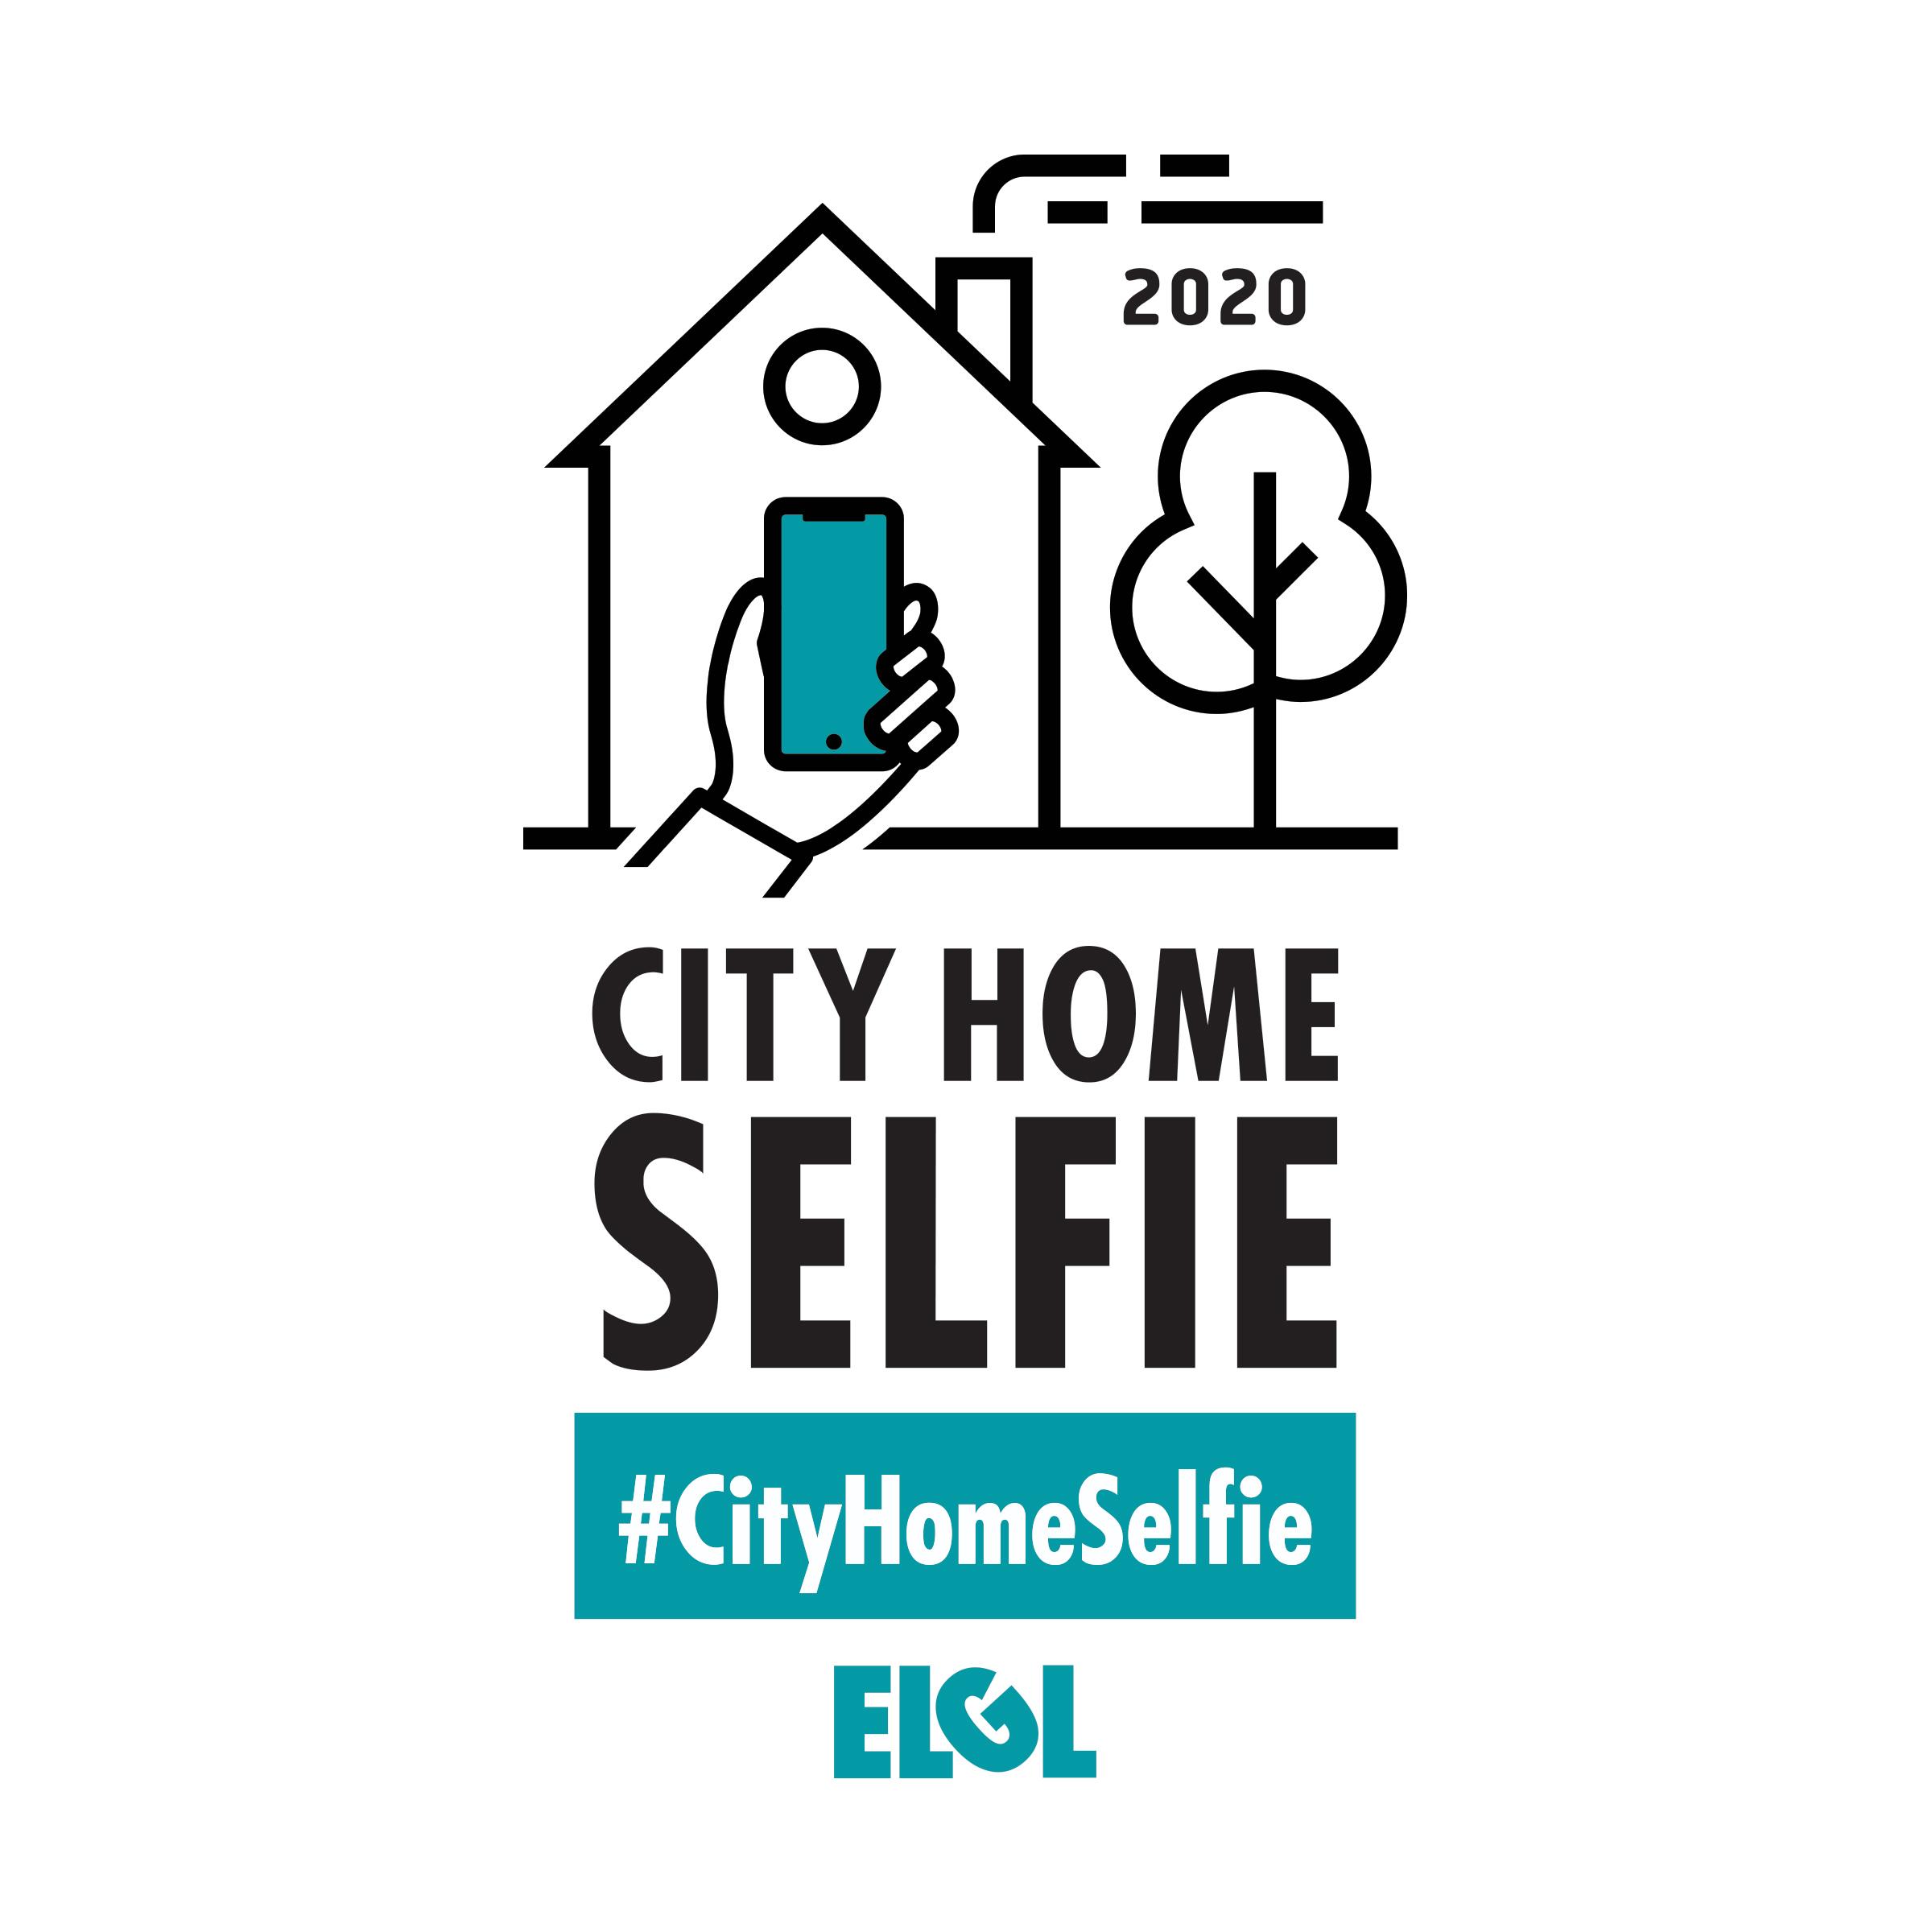 JPG cityhomeselfie logo